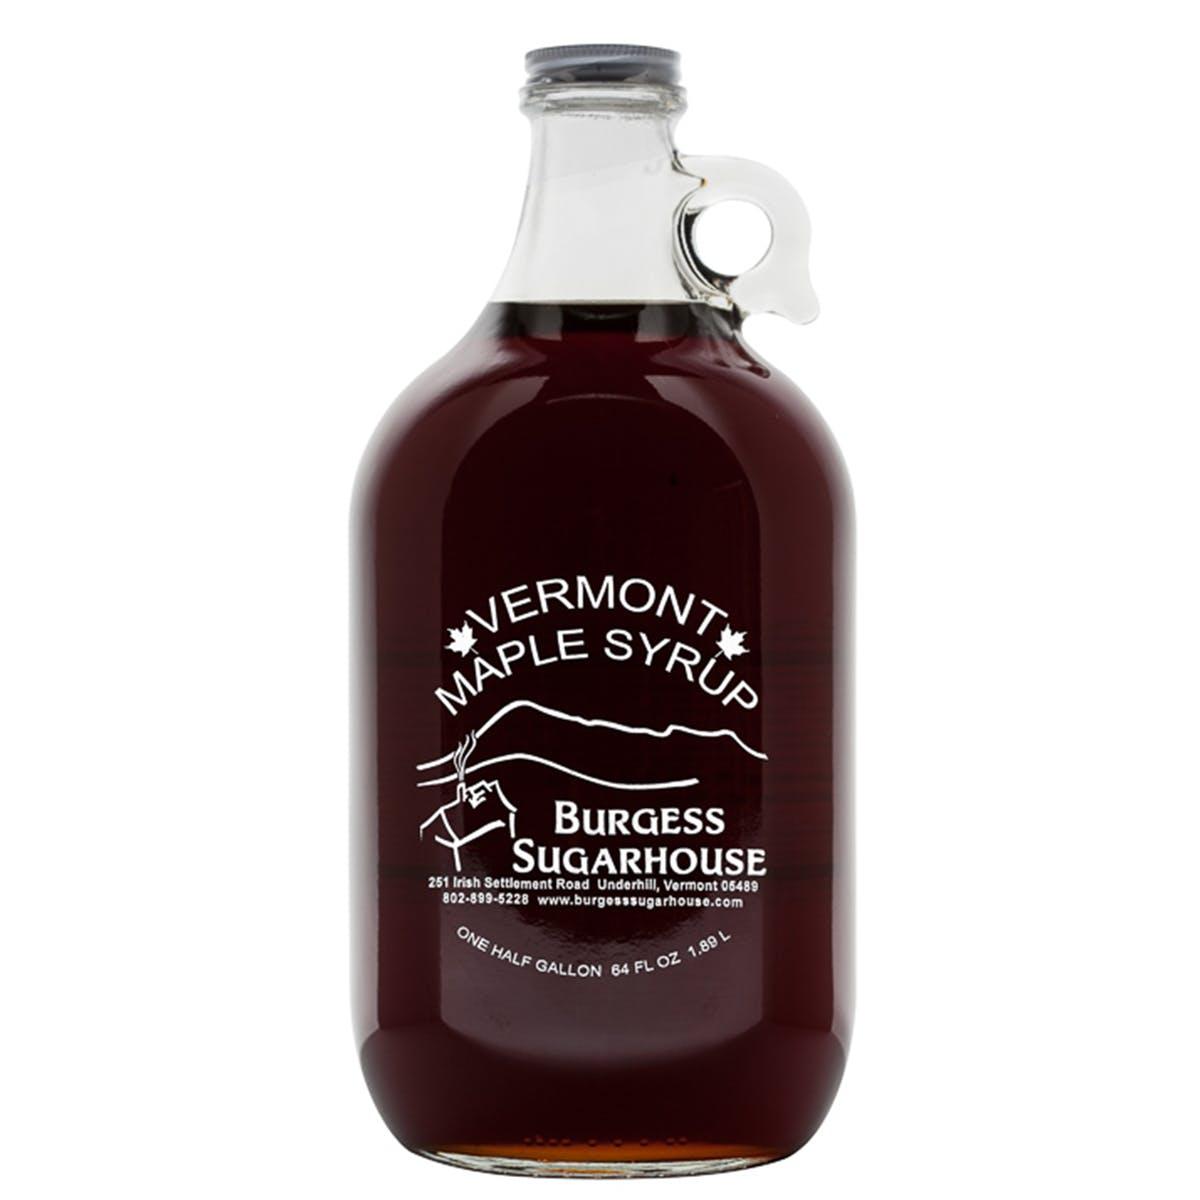 Burgess Sugarhouse - Grade A: Dark Color with Robust Taste 1/2 Gallon